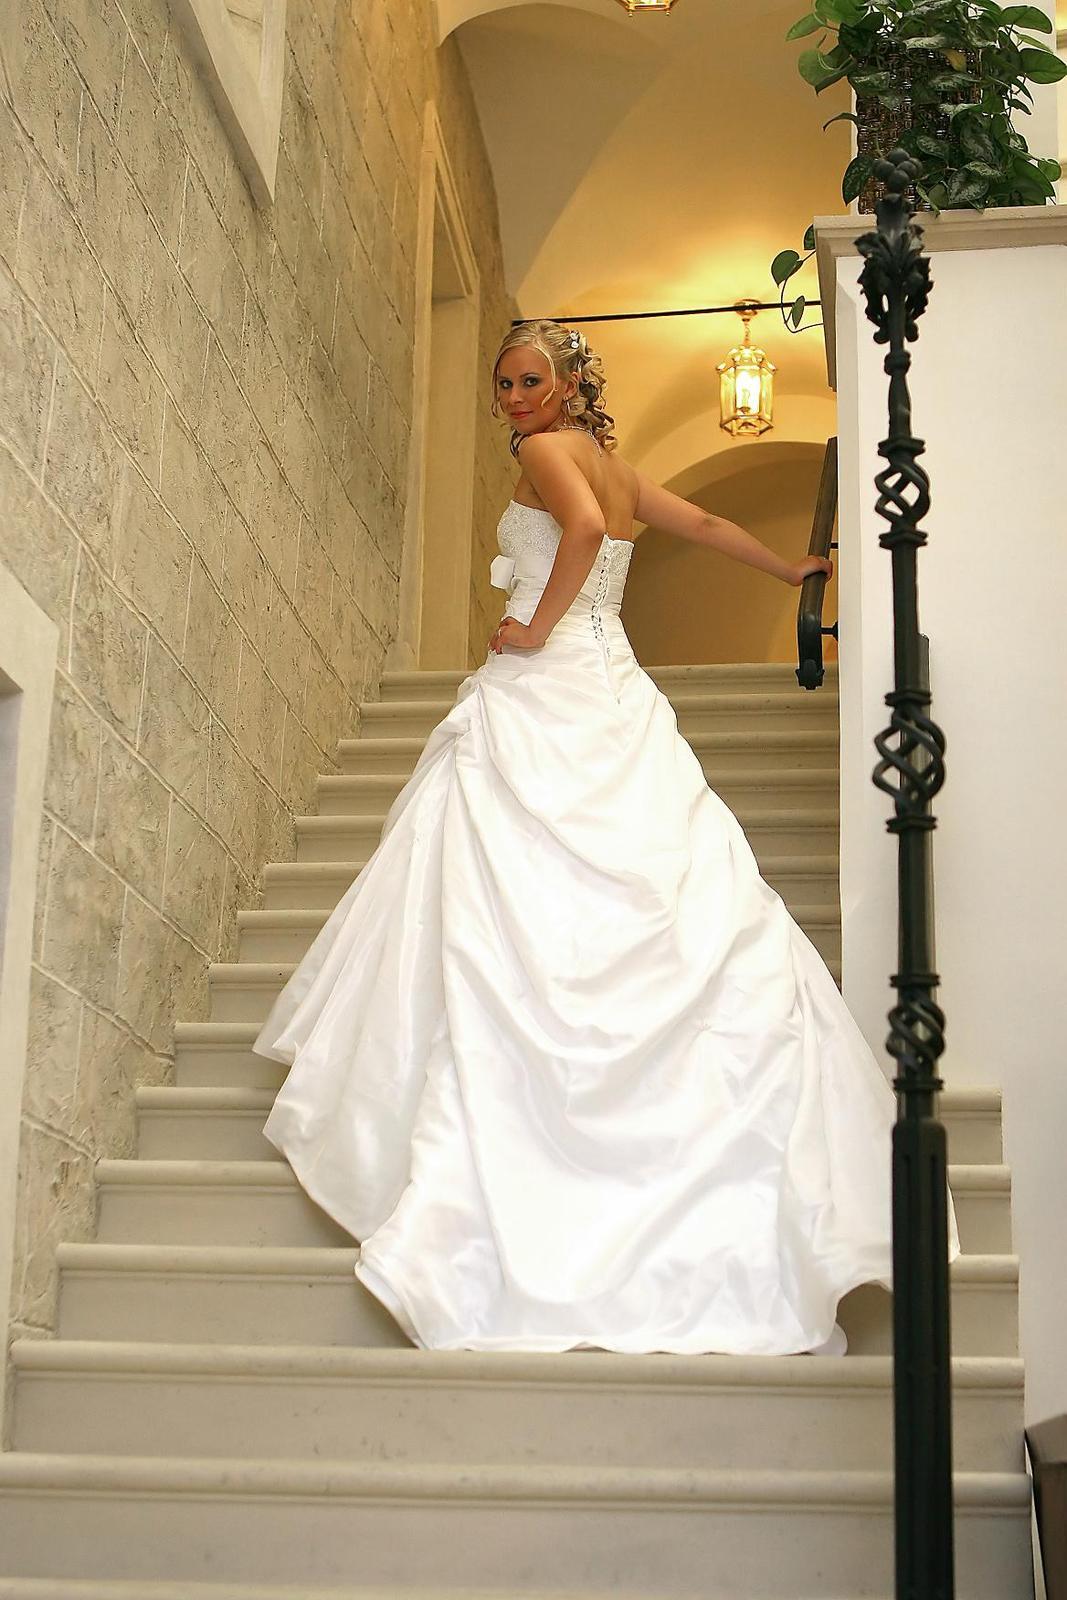 Svadobné šaty Maria Karin - model Grace - Obrázok č. 2